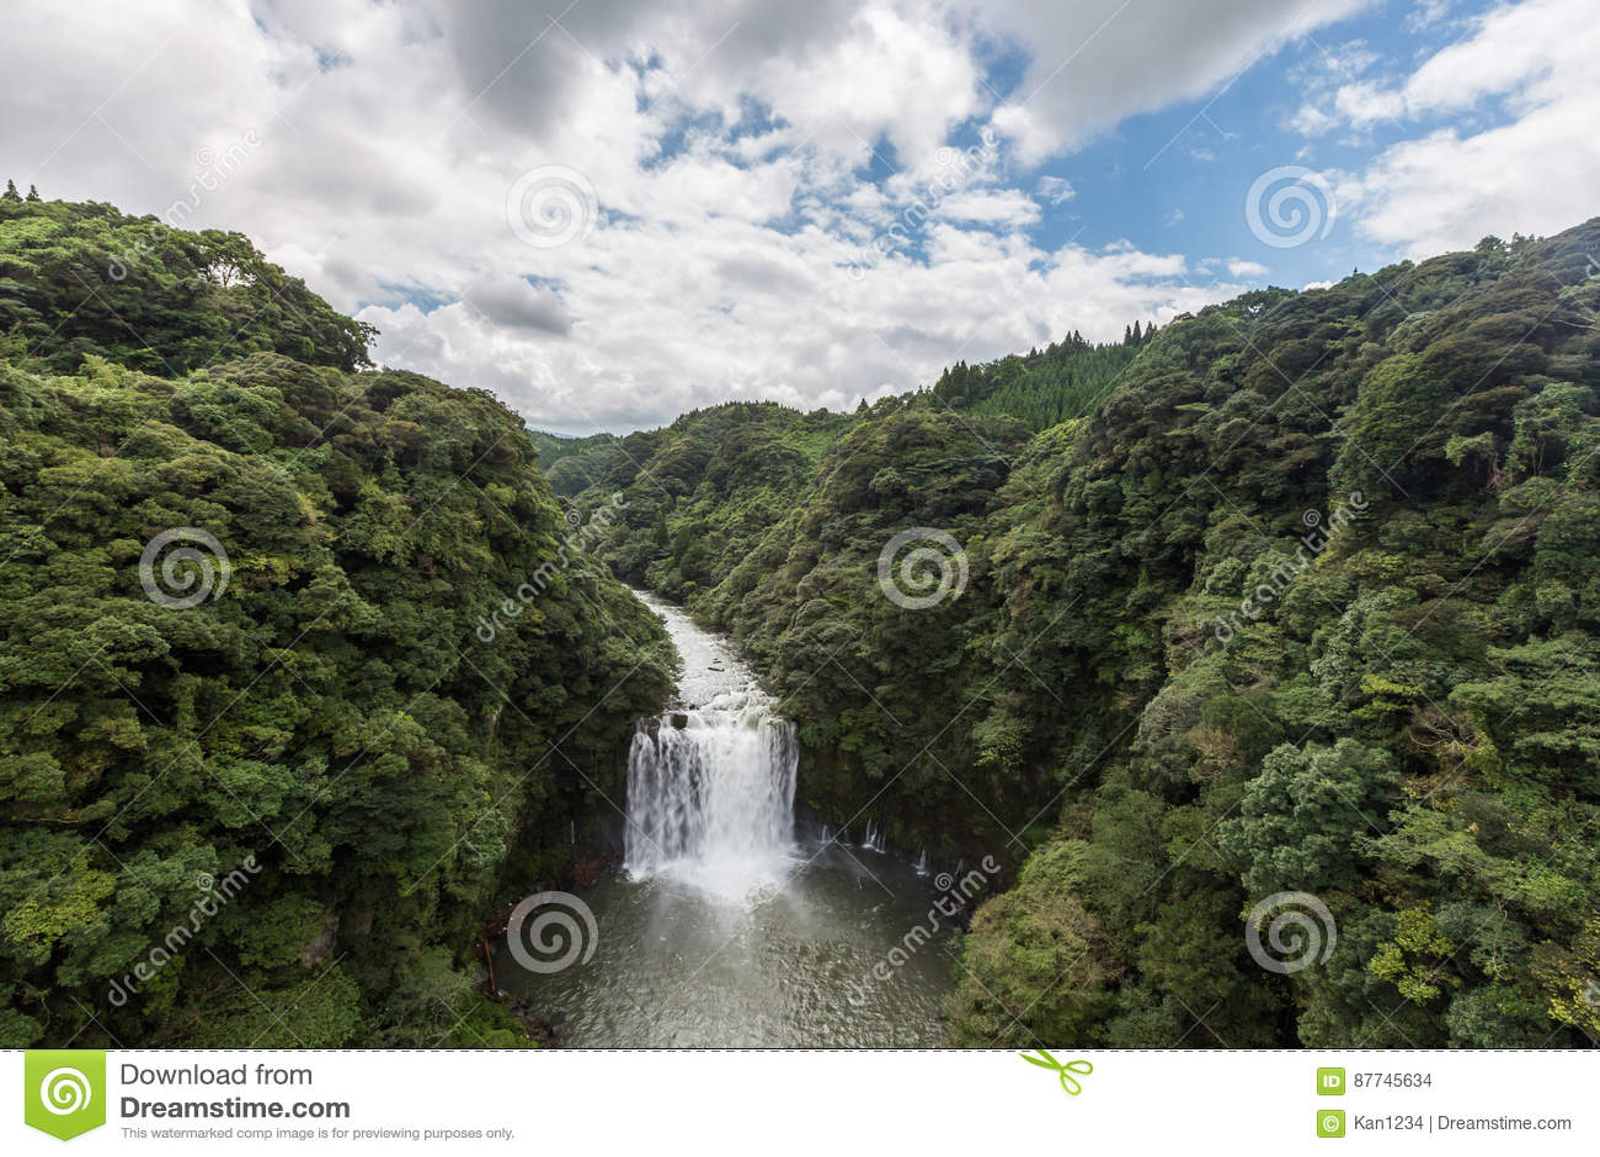 Cachoeira de Kamikawa Otaki e floresta verde em Kagoshima, Kyushu